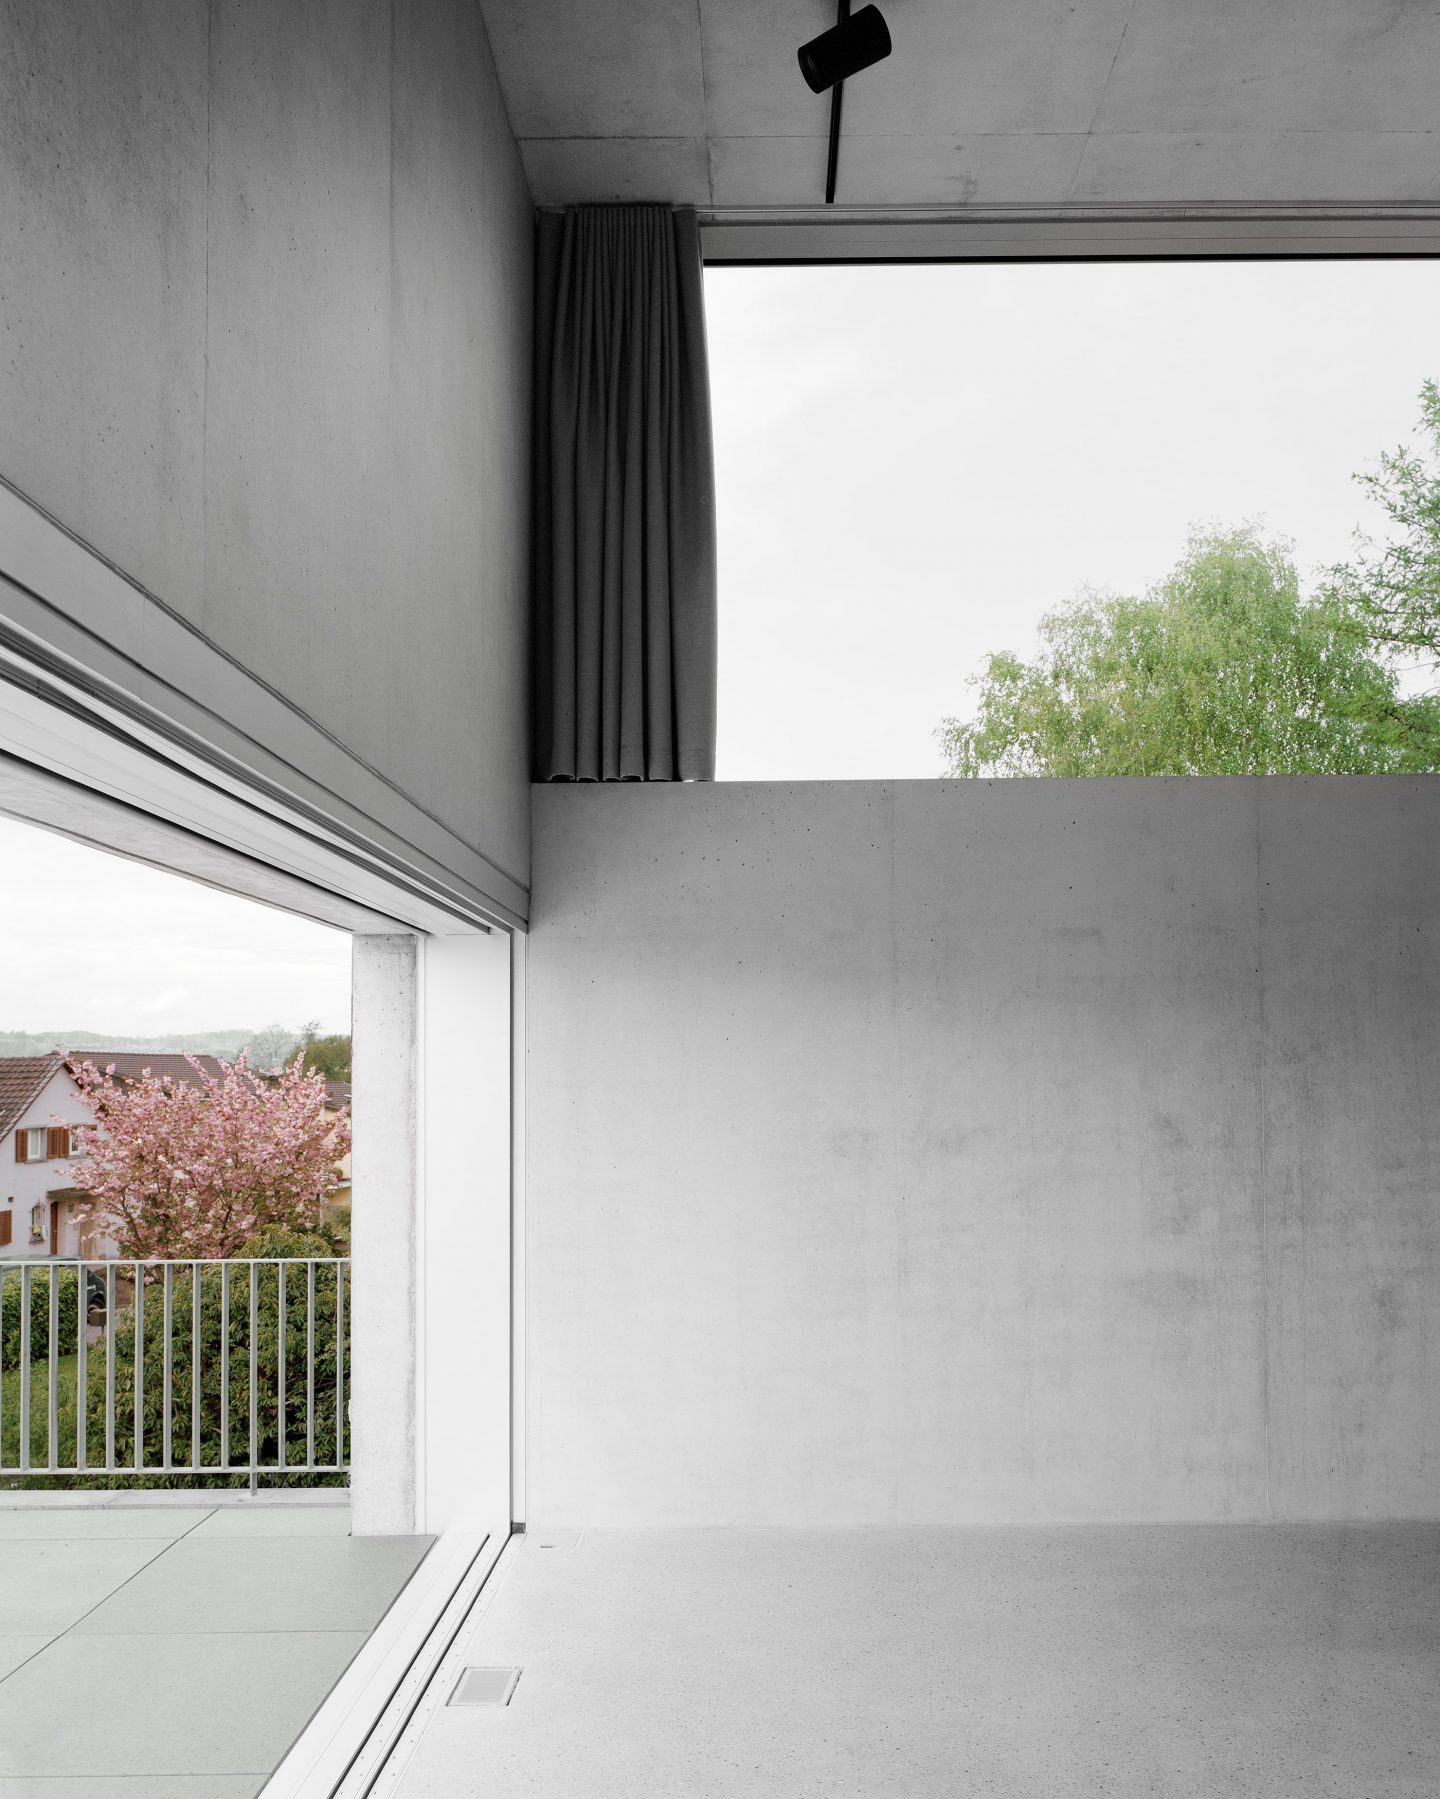 IGNANT-Architeecture-HouseB-5-min